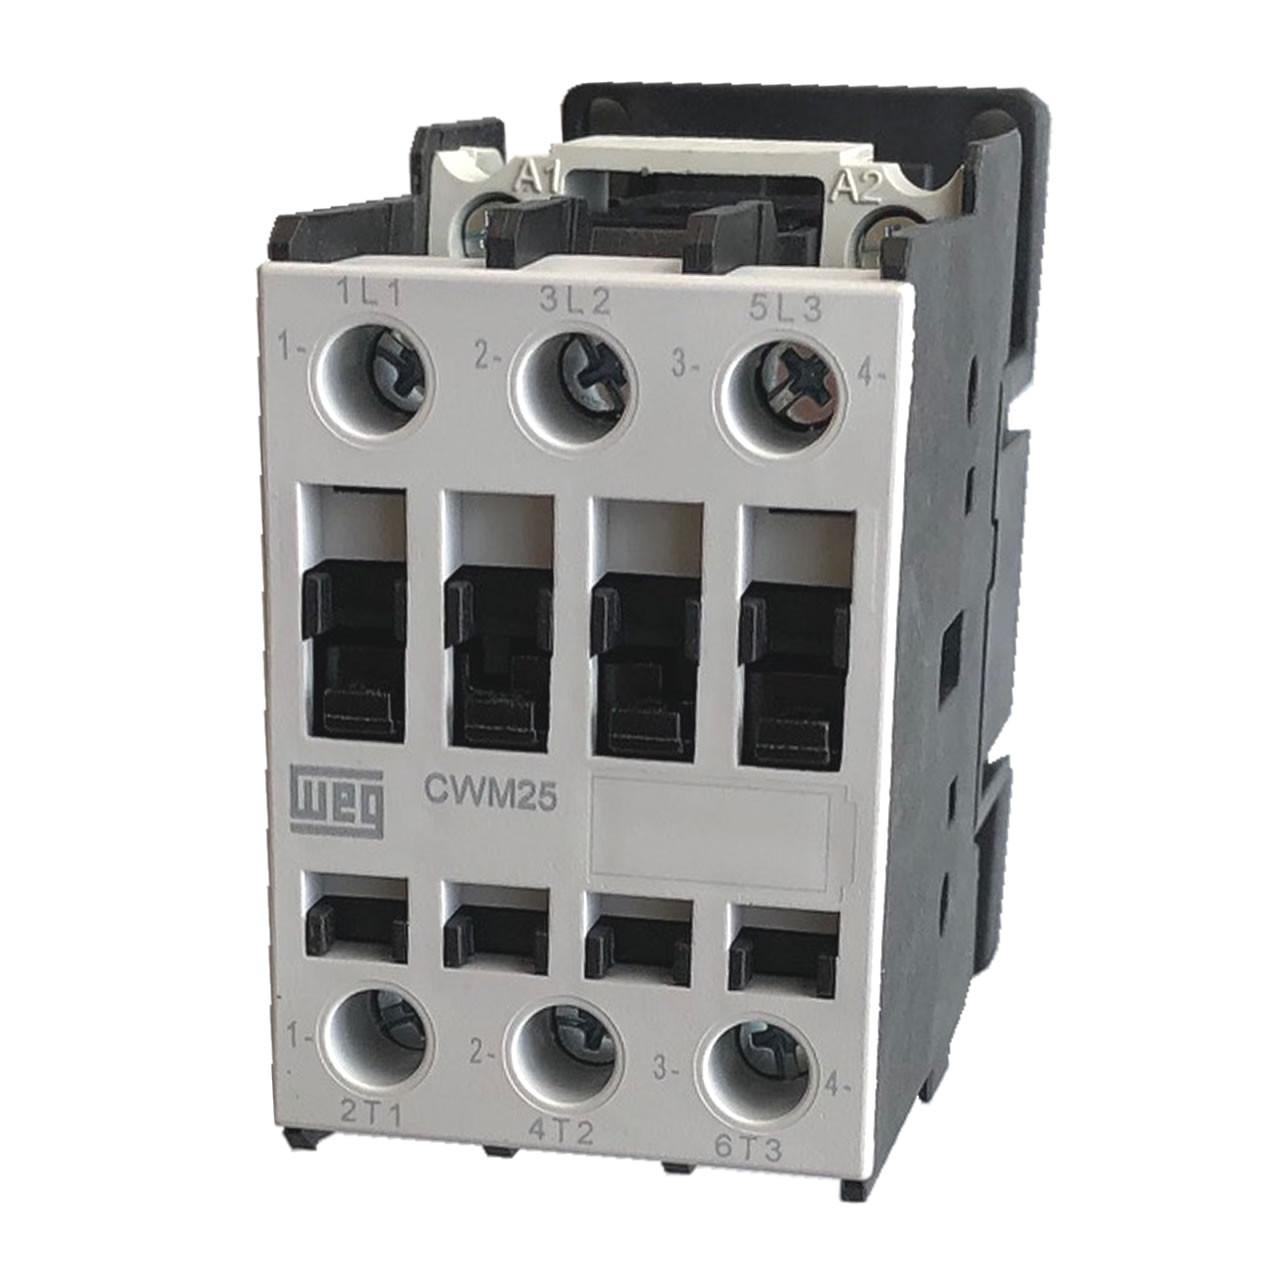 WEG CWM25 contactor